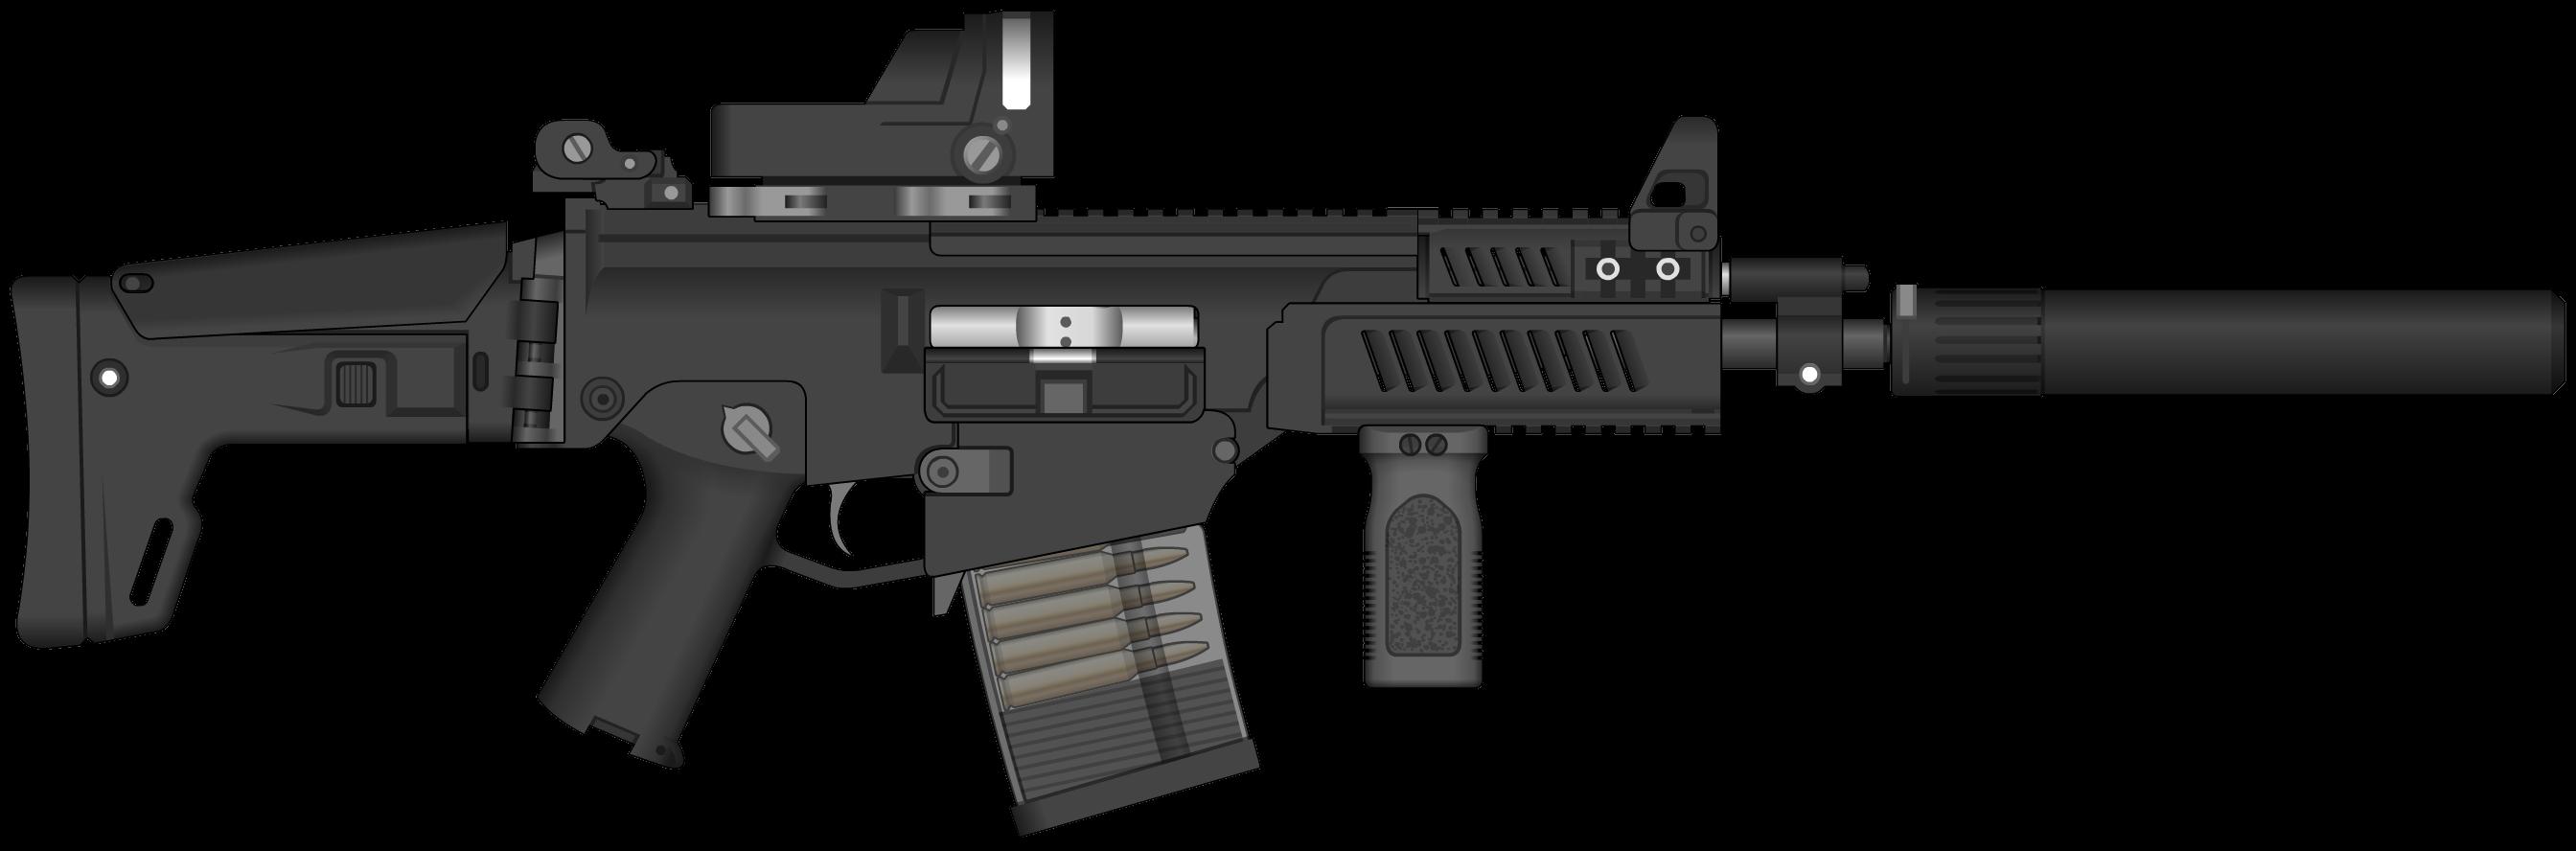 Assault Rifle Clipart PNG Image